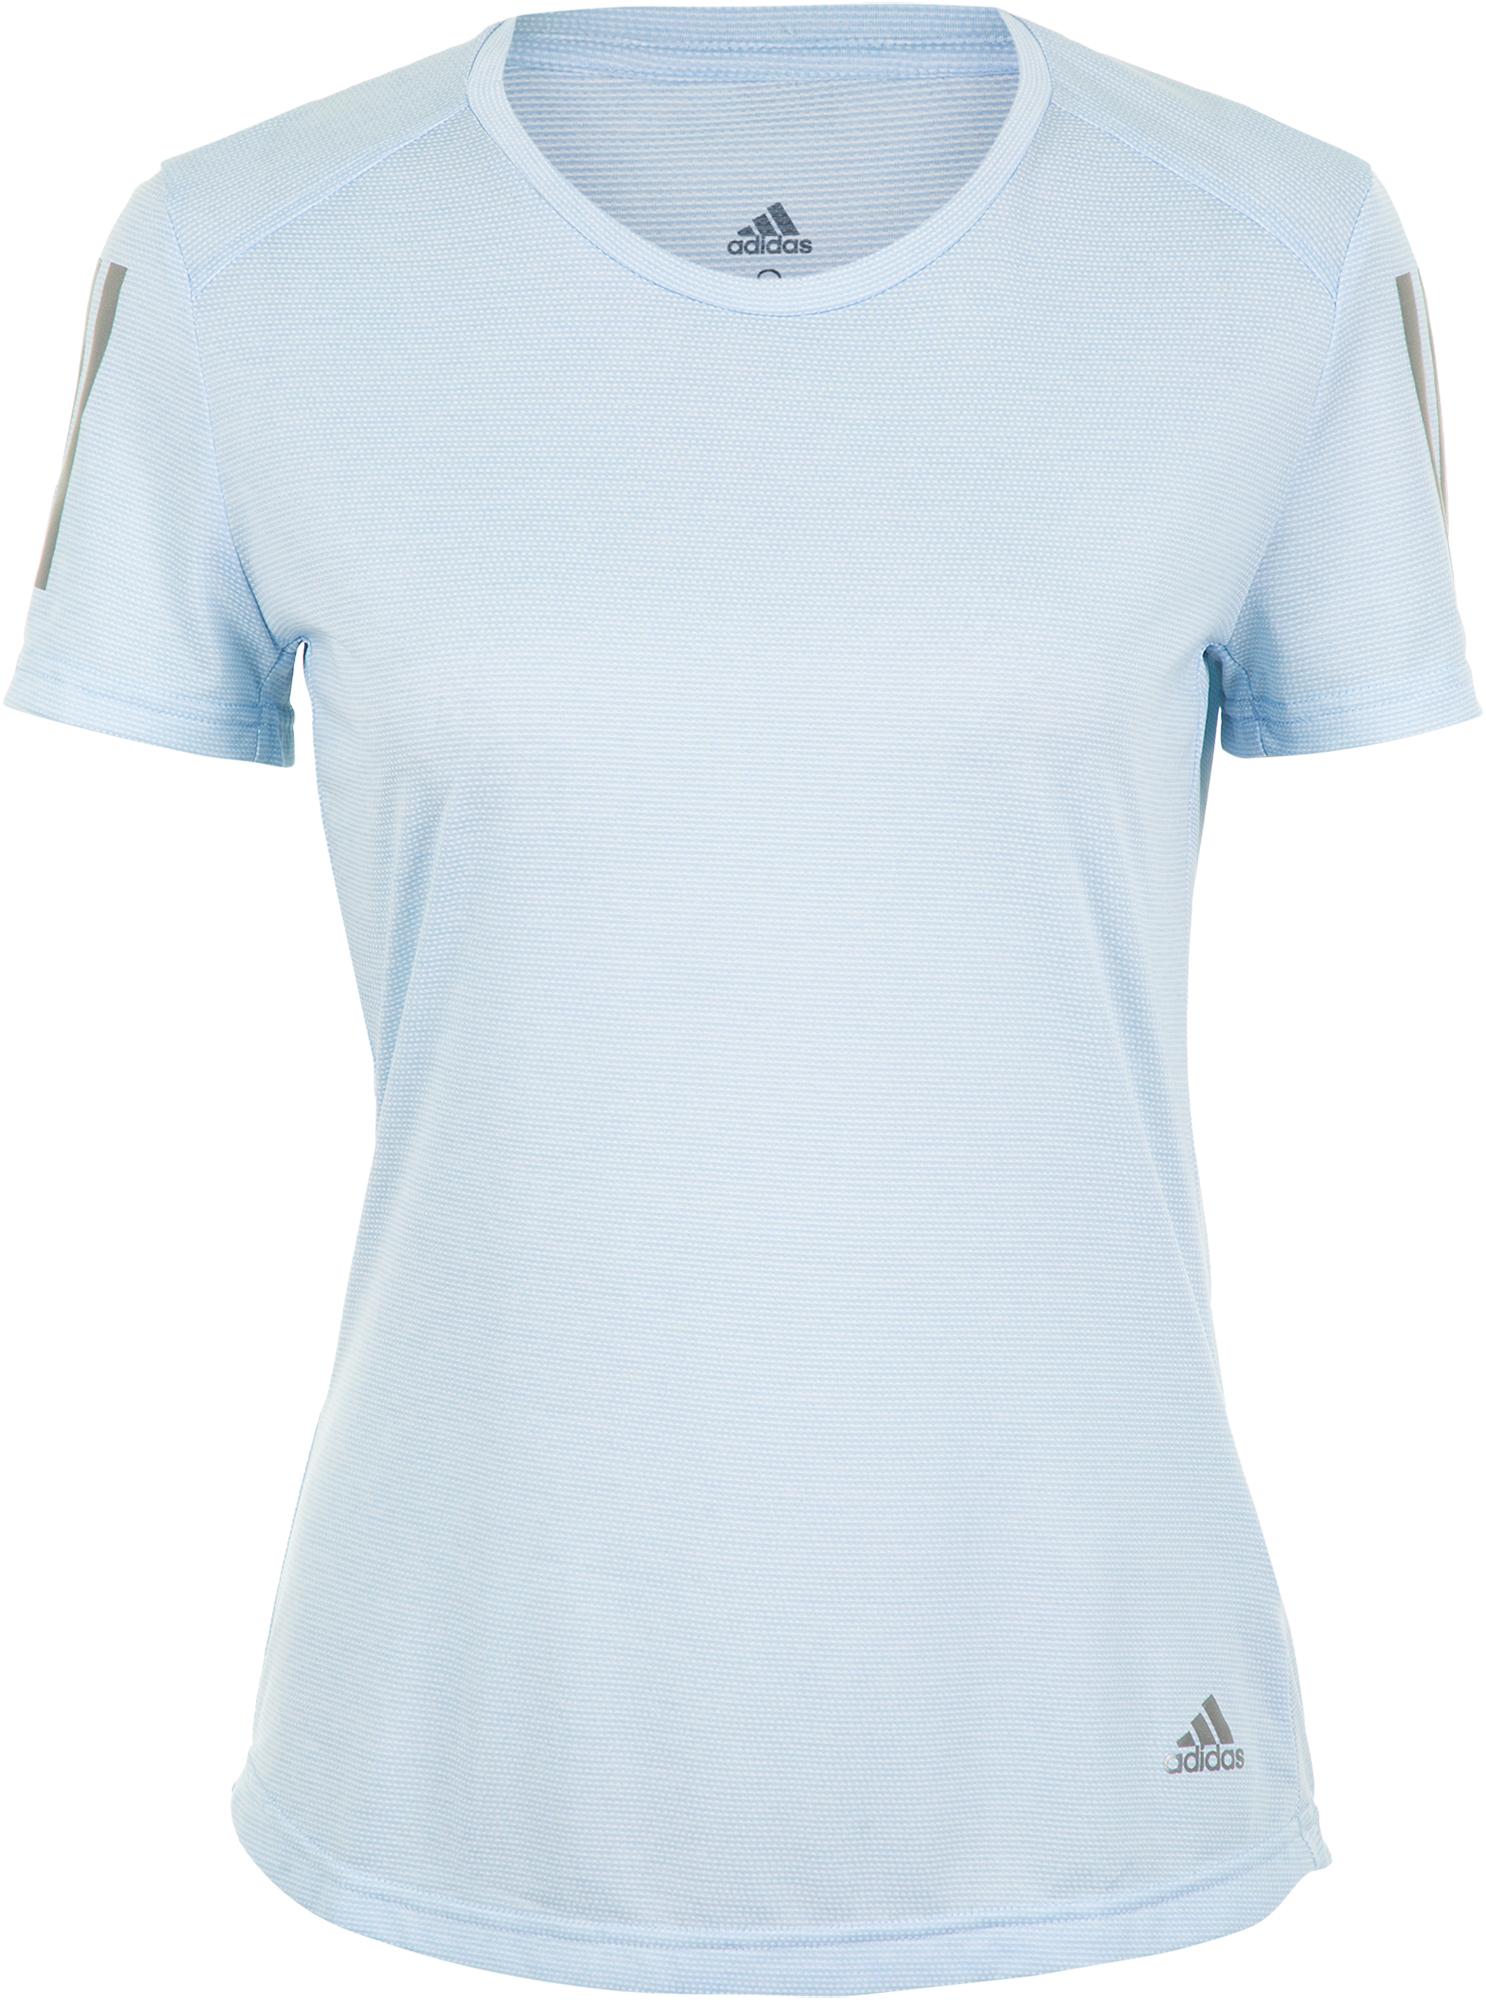 Adidas Футболка женская Adidas Own The Run, размер 46-48 цена